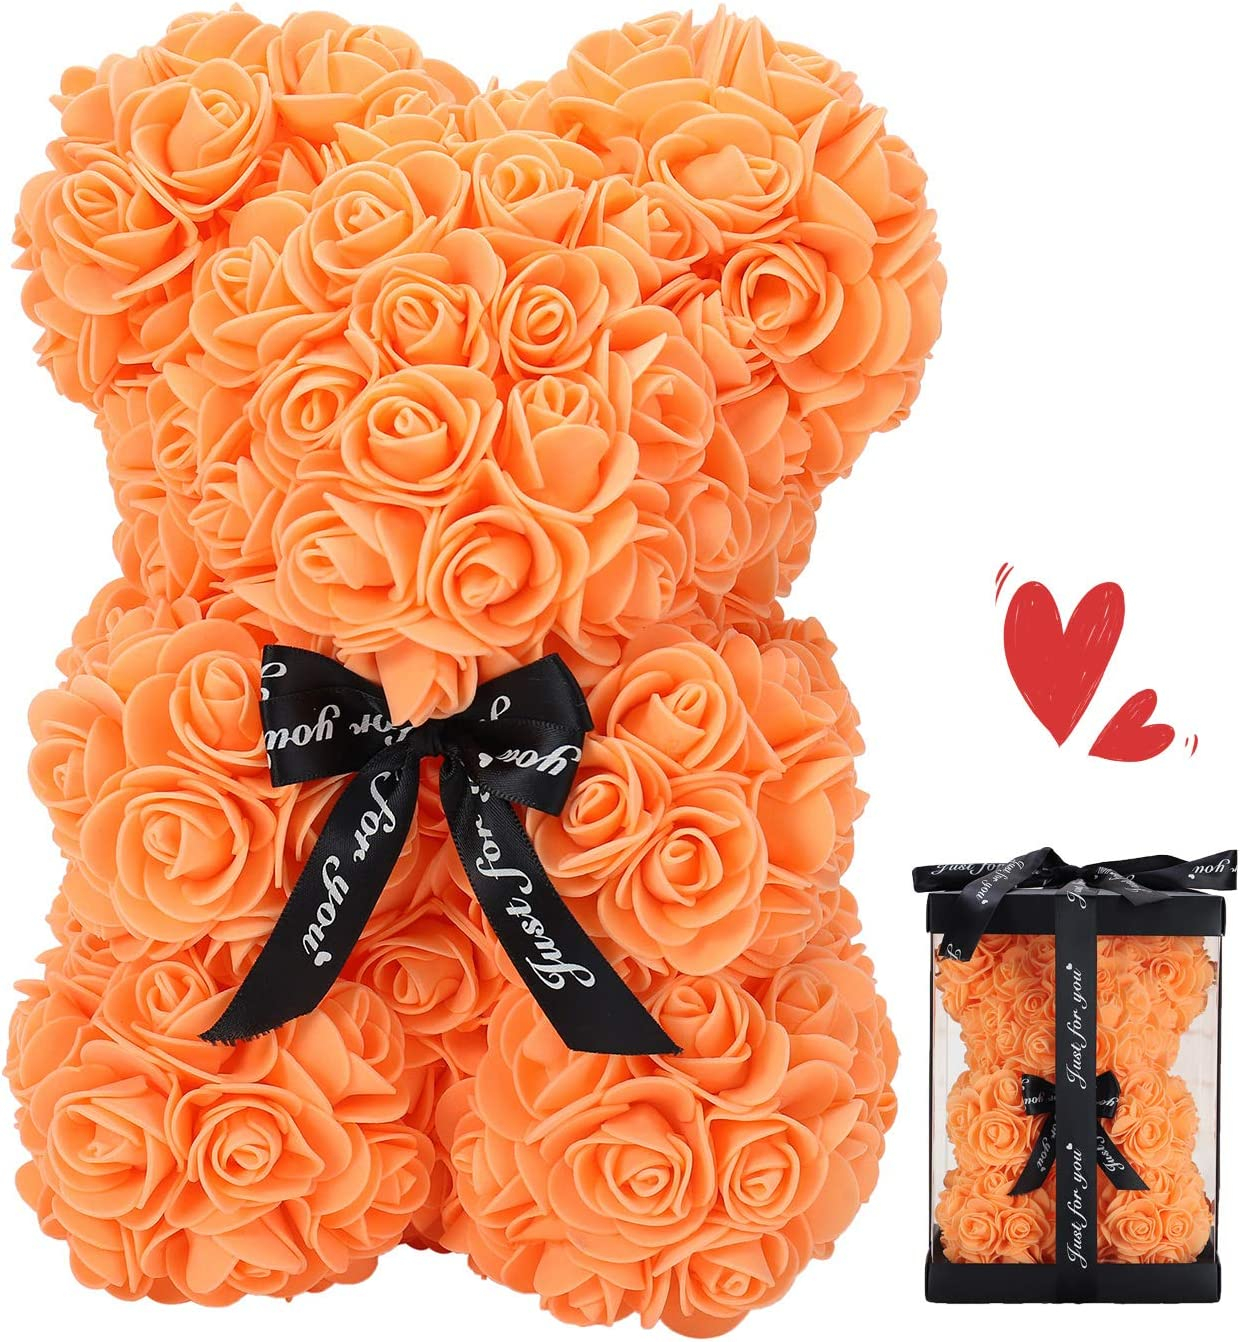 ZFDEBY Rose Bear Flower Made Philadelphia Mall Hand Best Dedication Teddy